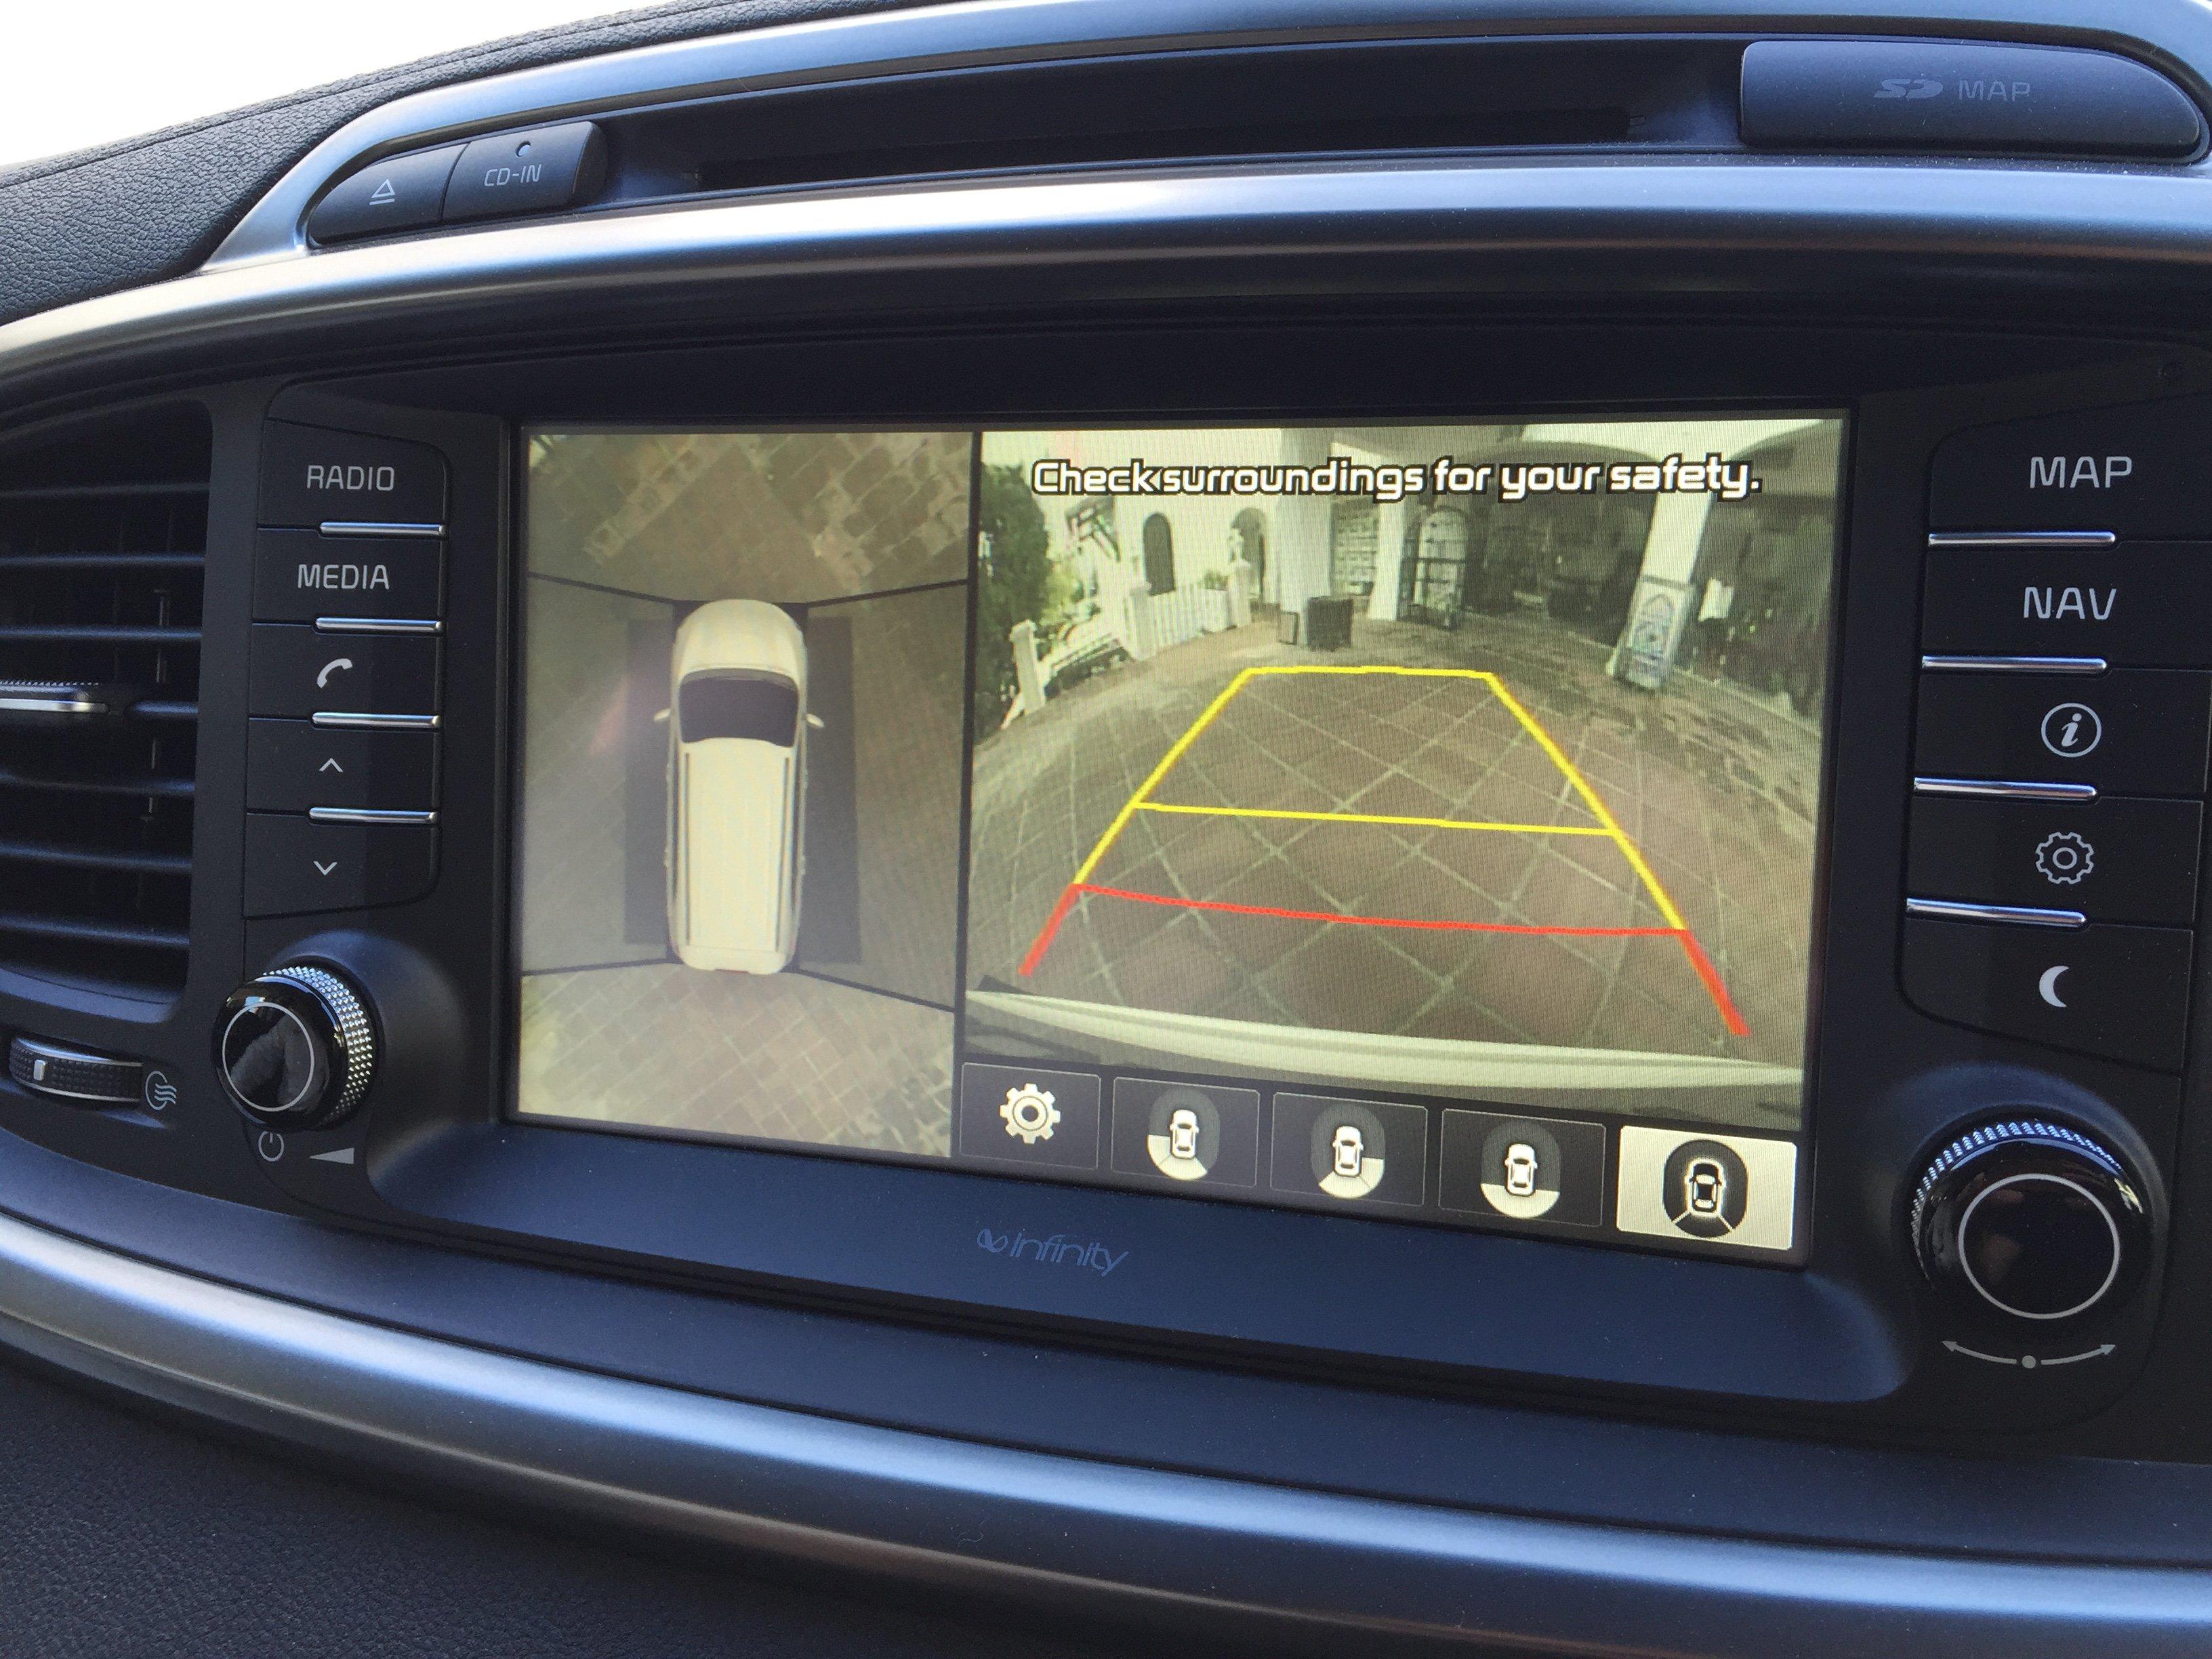 2016 kia sorento navigation system manual